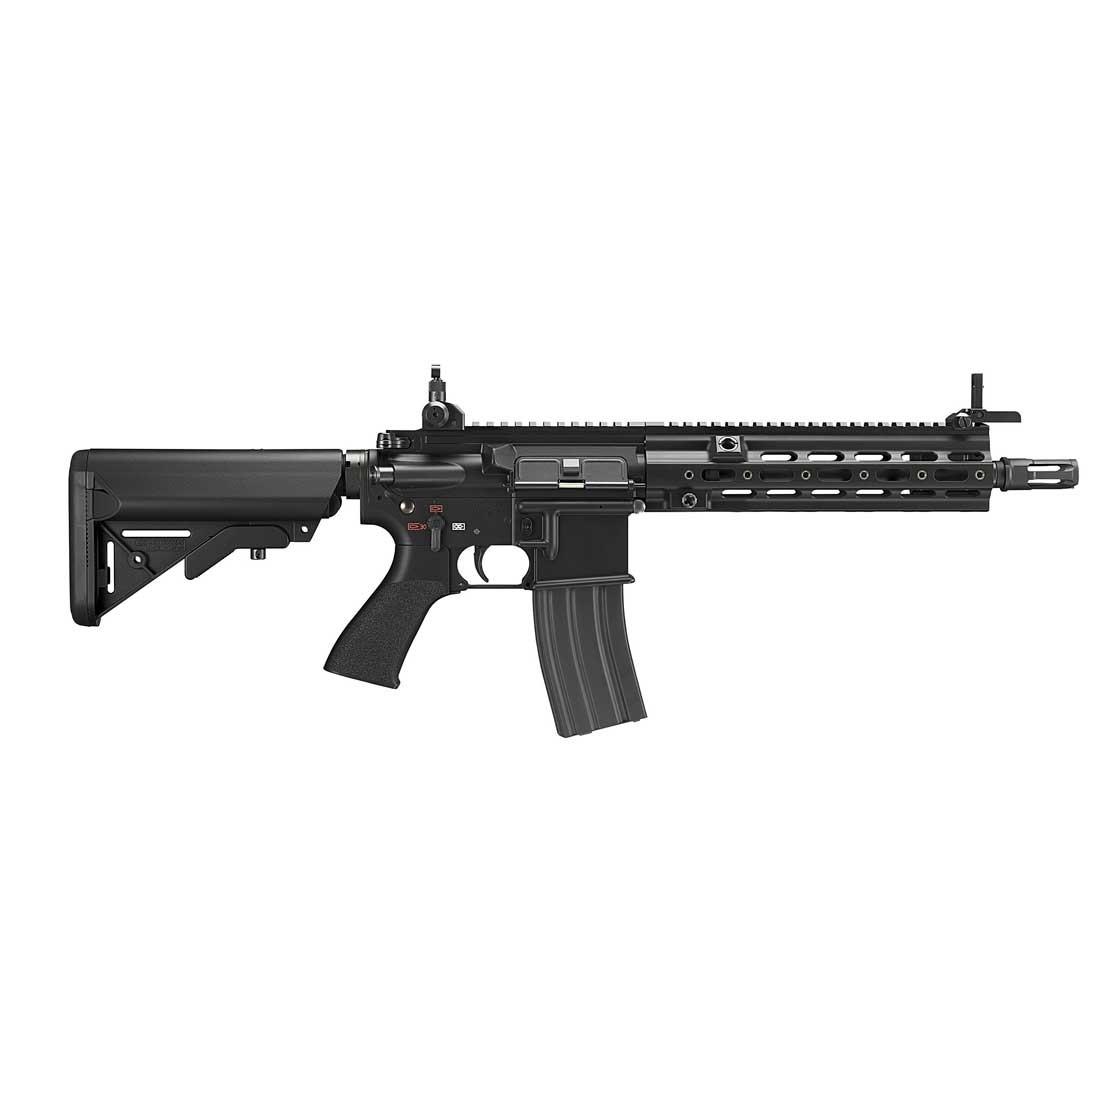 Tokyo Marui 416 Delta Custom NGRS Next Gen Recoil System EBB Rifle (Black)